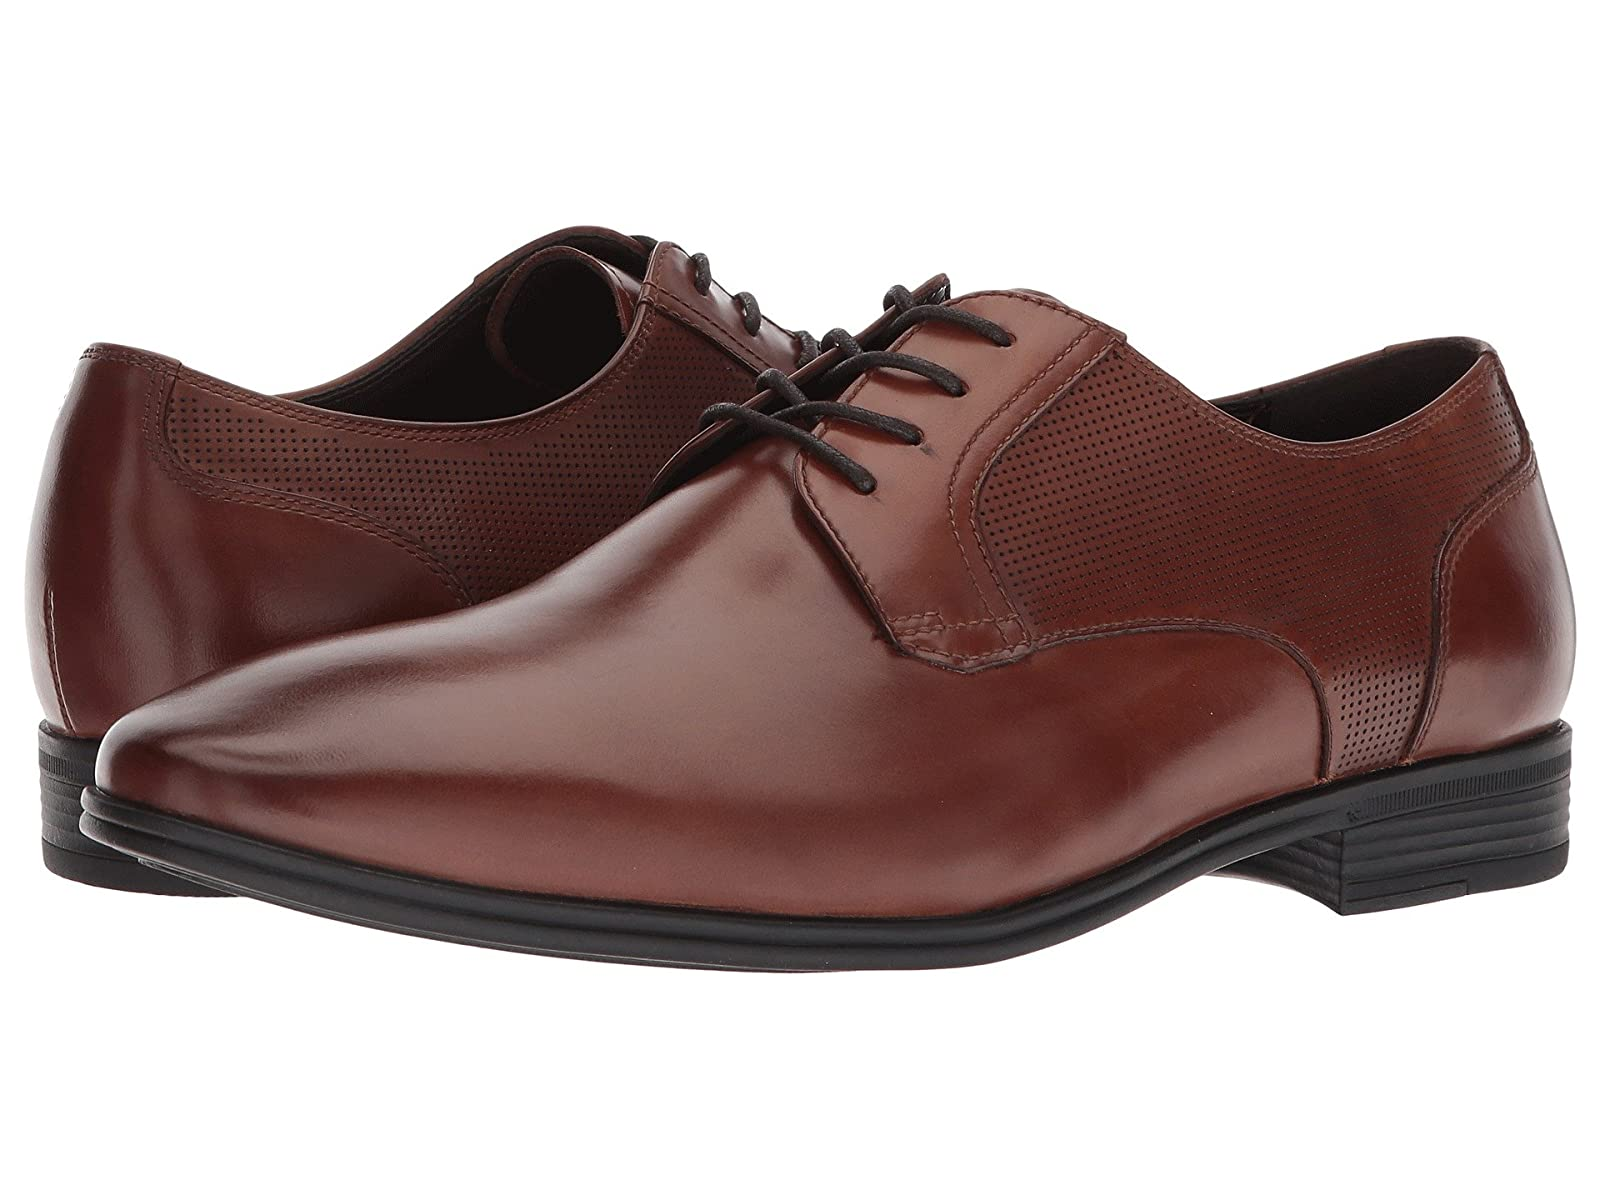 Kenneth Cole Reaction Min OxfordAtmospheric grades have affordable shoes